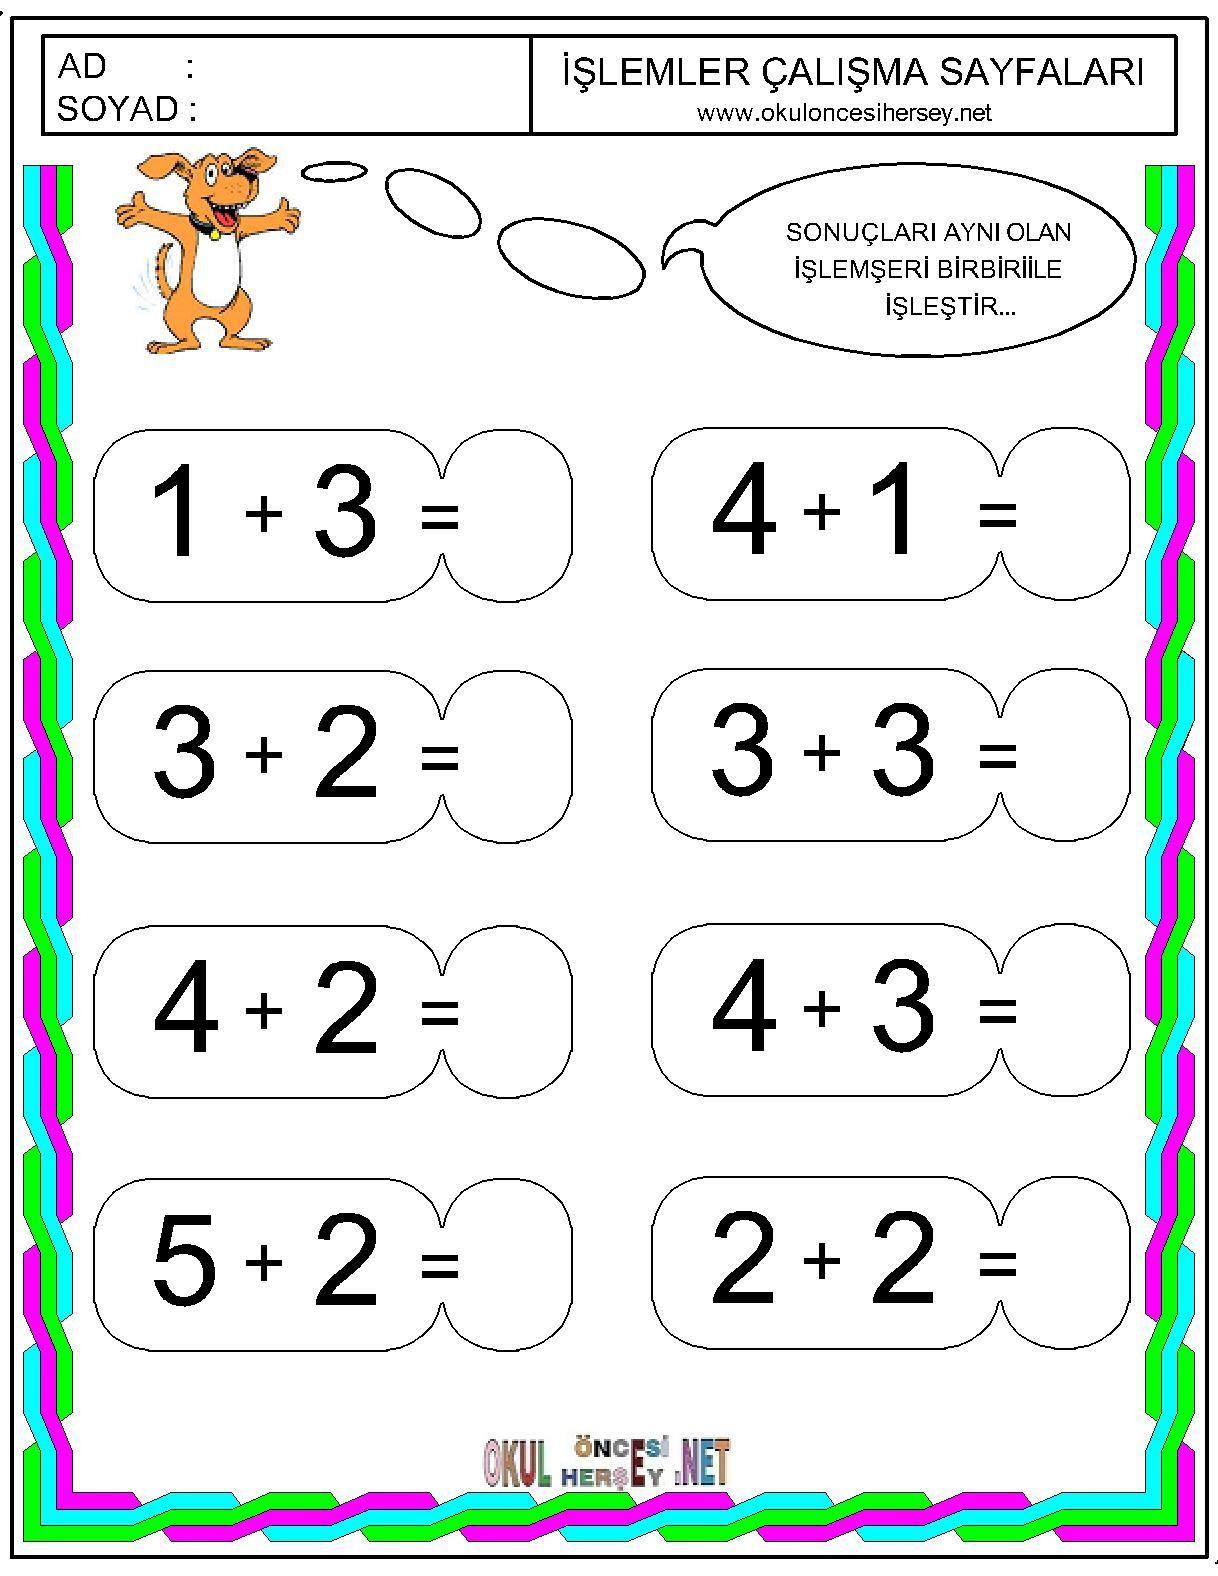 Okul Oncesi Matematik Calisma Sayfalari Google Da Ara Okul